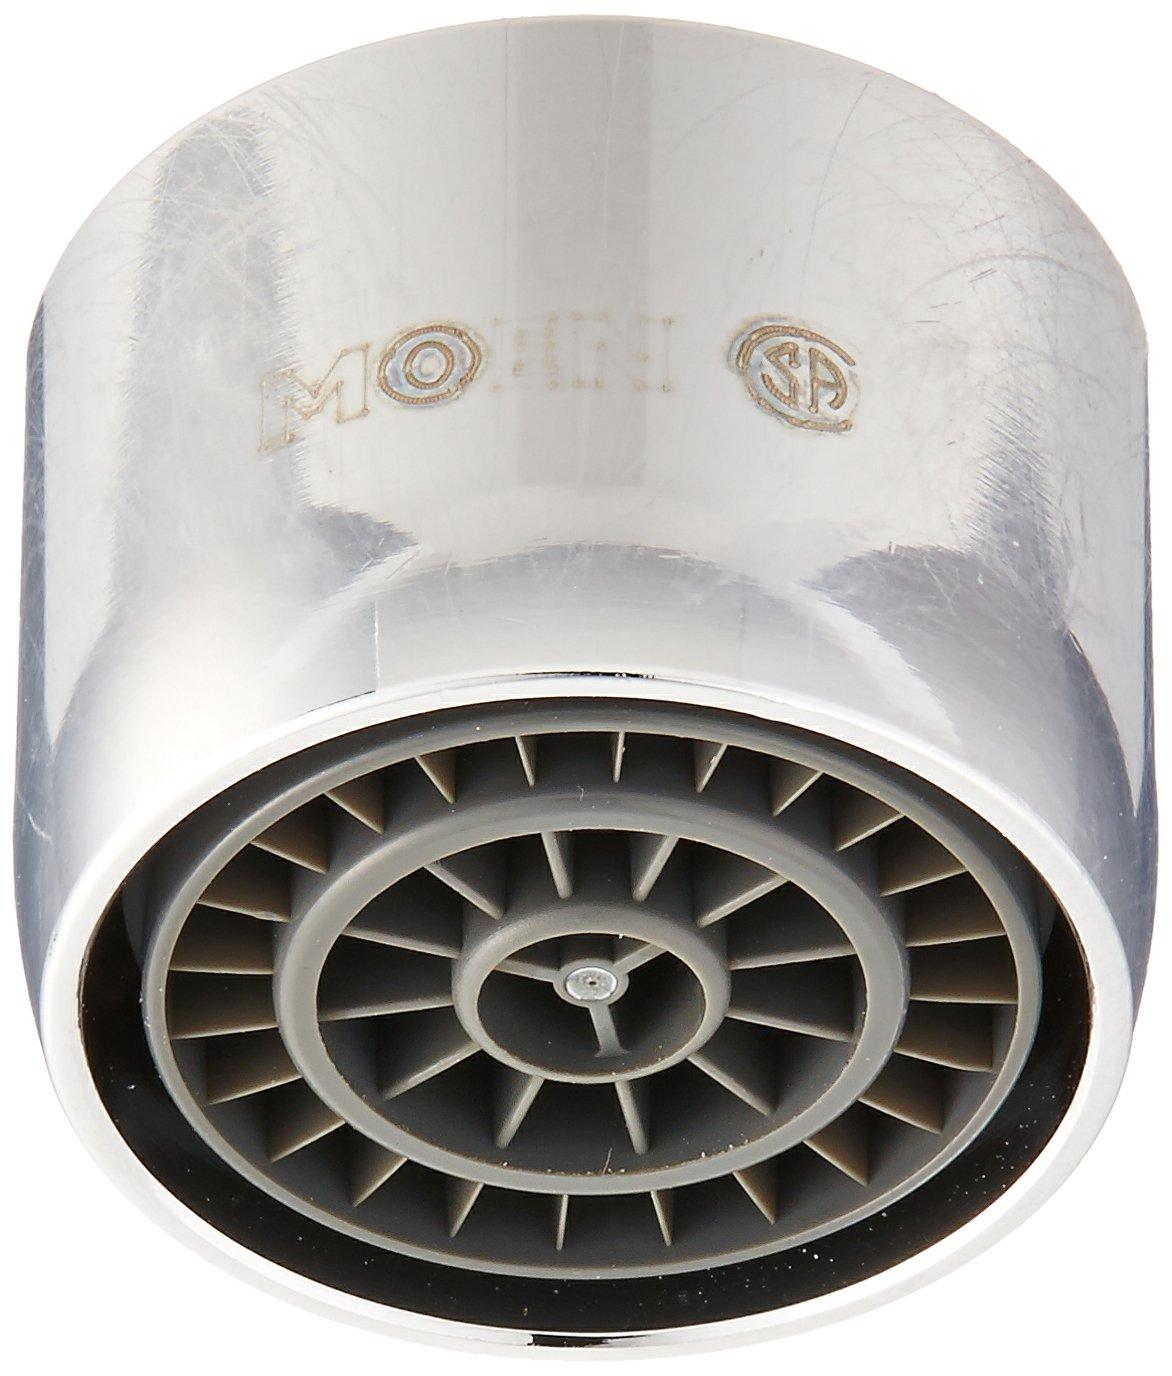 Moen 133120 Chrome Lavatory Faucet Aerator with Female Thread ...